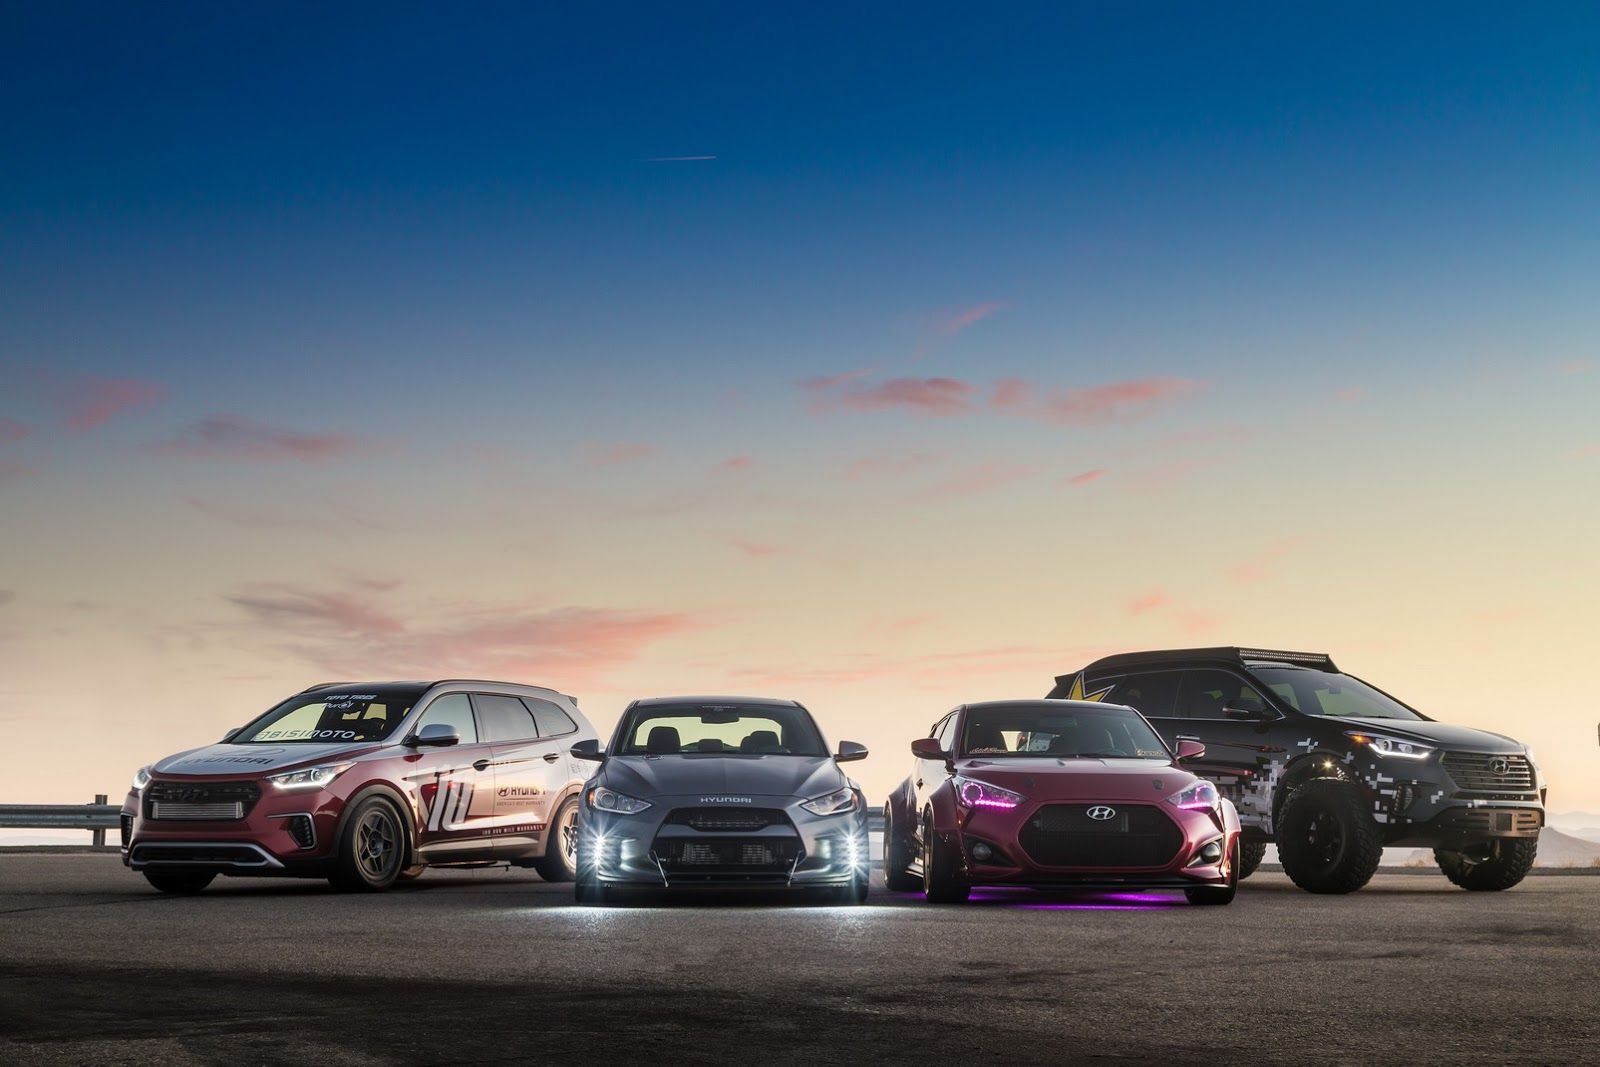 Hyundai Heats Up Five Cars For Sema Plus New Skunkworks Race Concept Carscoops Hyundai Hyundai Veloster Racing